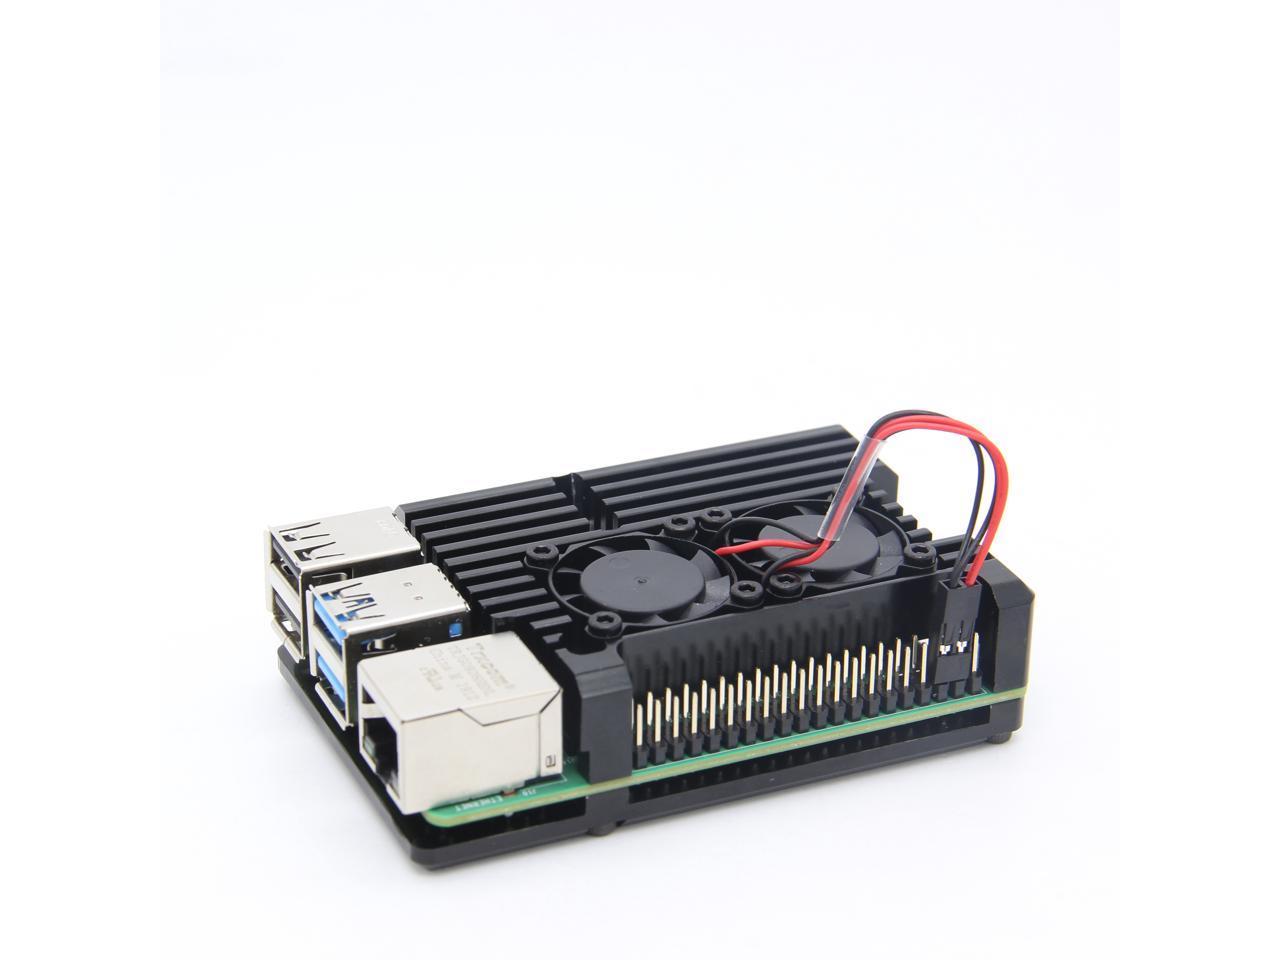 Heatsinks Cooling Shell Aluminum Alloy Cooling Shell Heatsink Housing Black with Fan Fit for Raspberry Pi 4 Model B